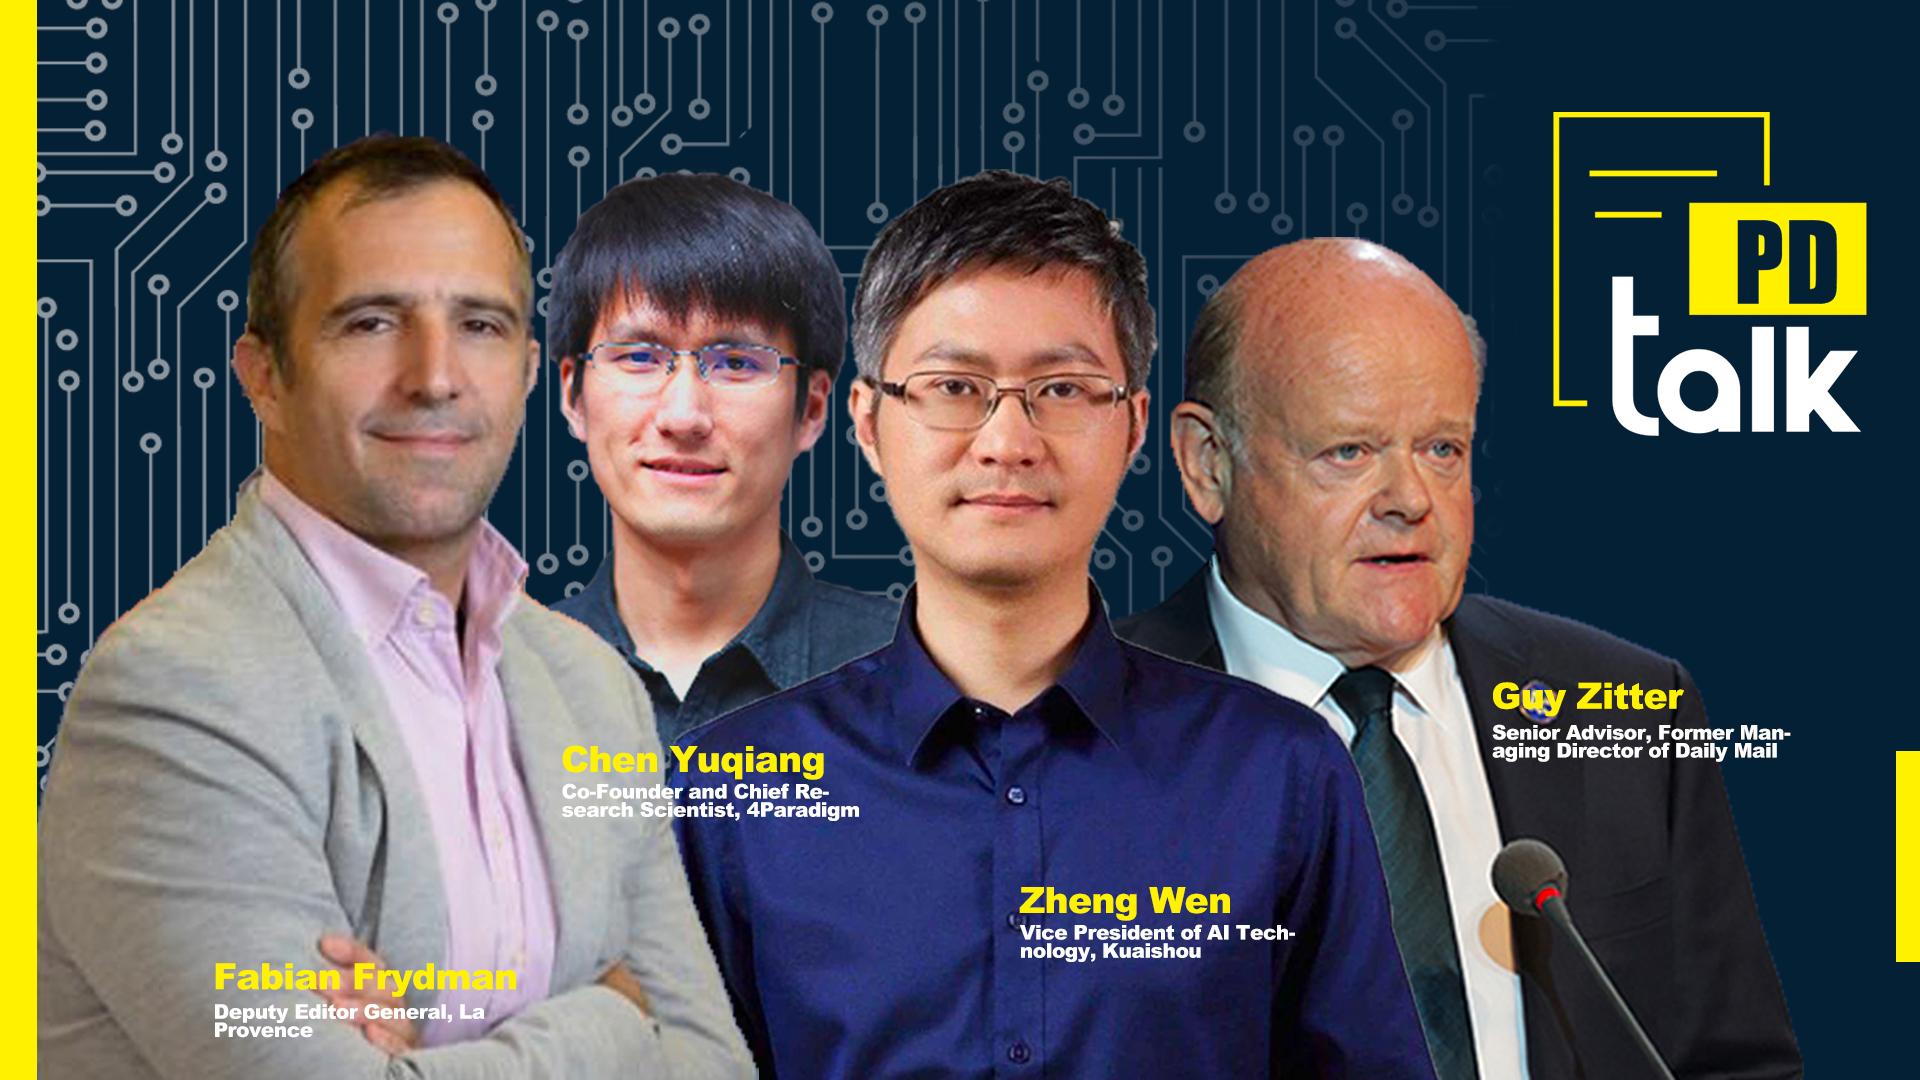 PD Talk | AI accelerates media transformation and advance